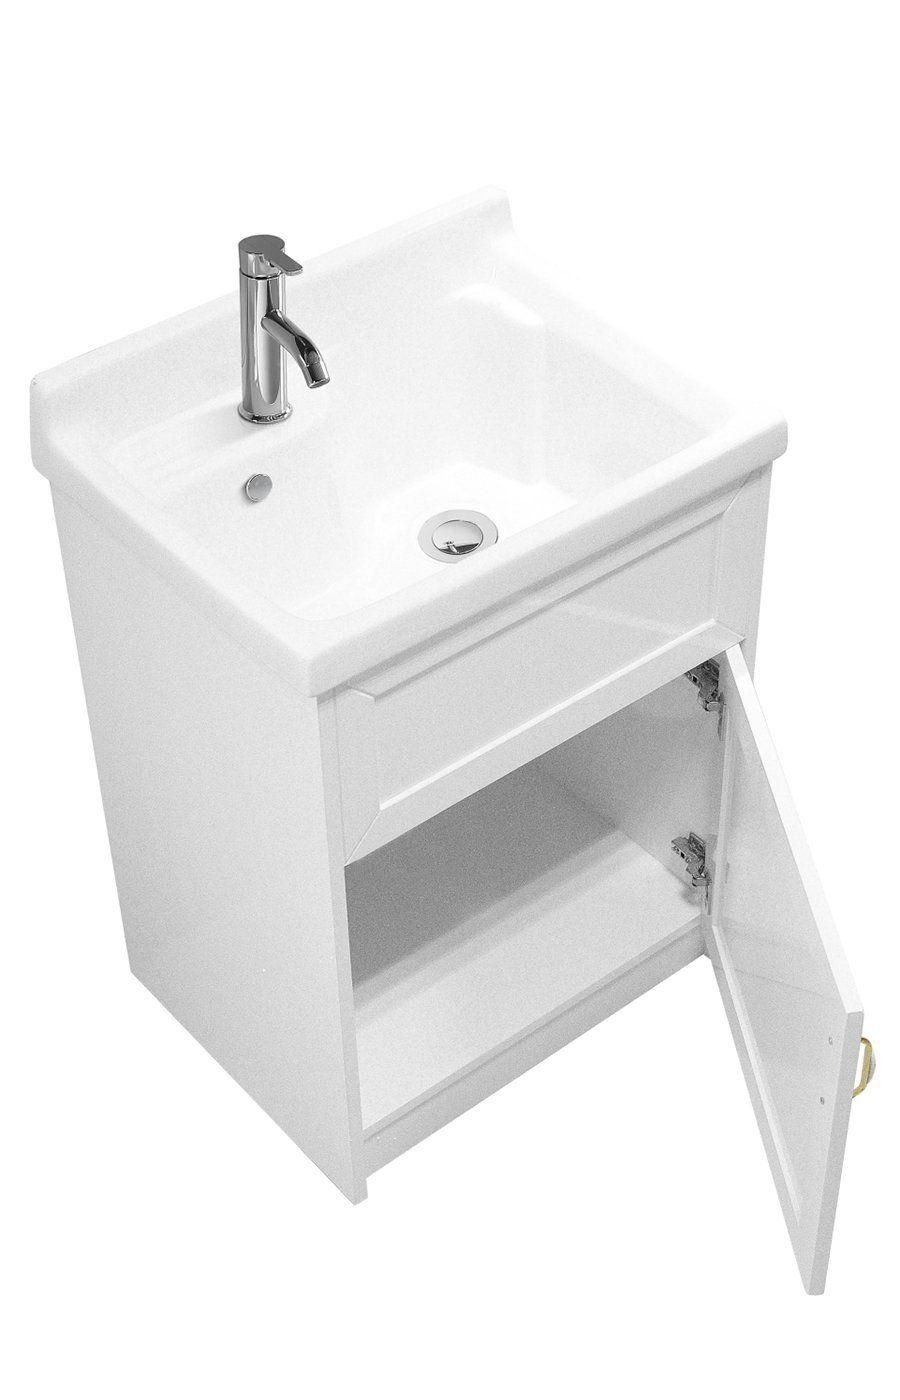 Sink Alexander 24 Quot White Utility Sink Modern Mop Slop Tub Deep Sink Ceramic Laundry Room Vanity Cabinet Contemporary Hardwoo Utility Sink Sink Deep Sink